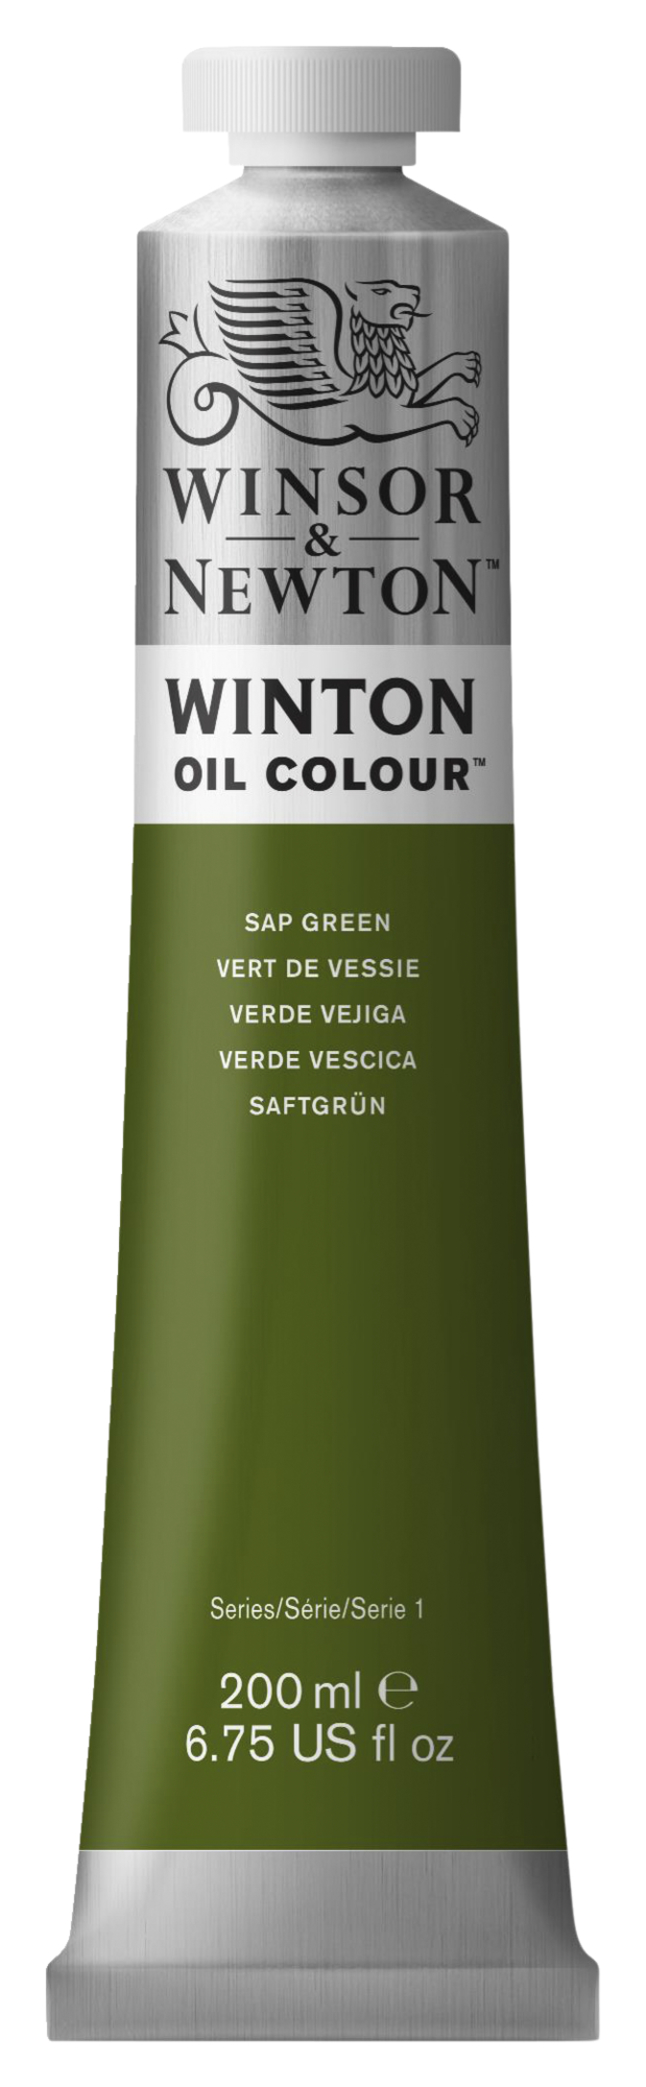 Oil Paint, Item Number 237930